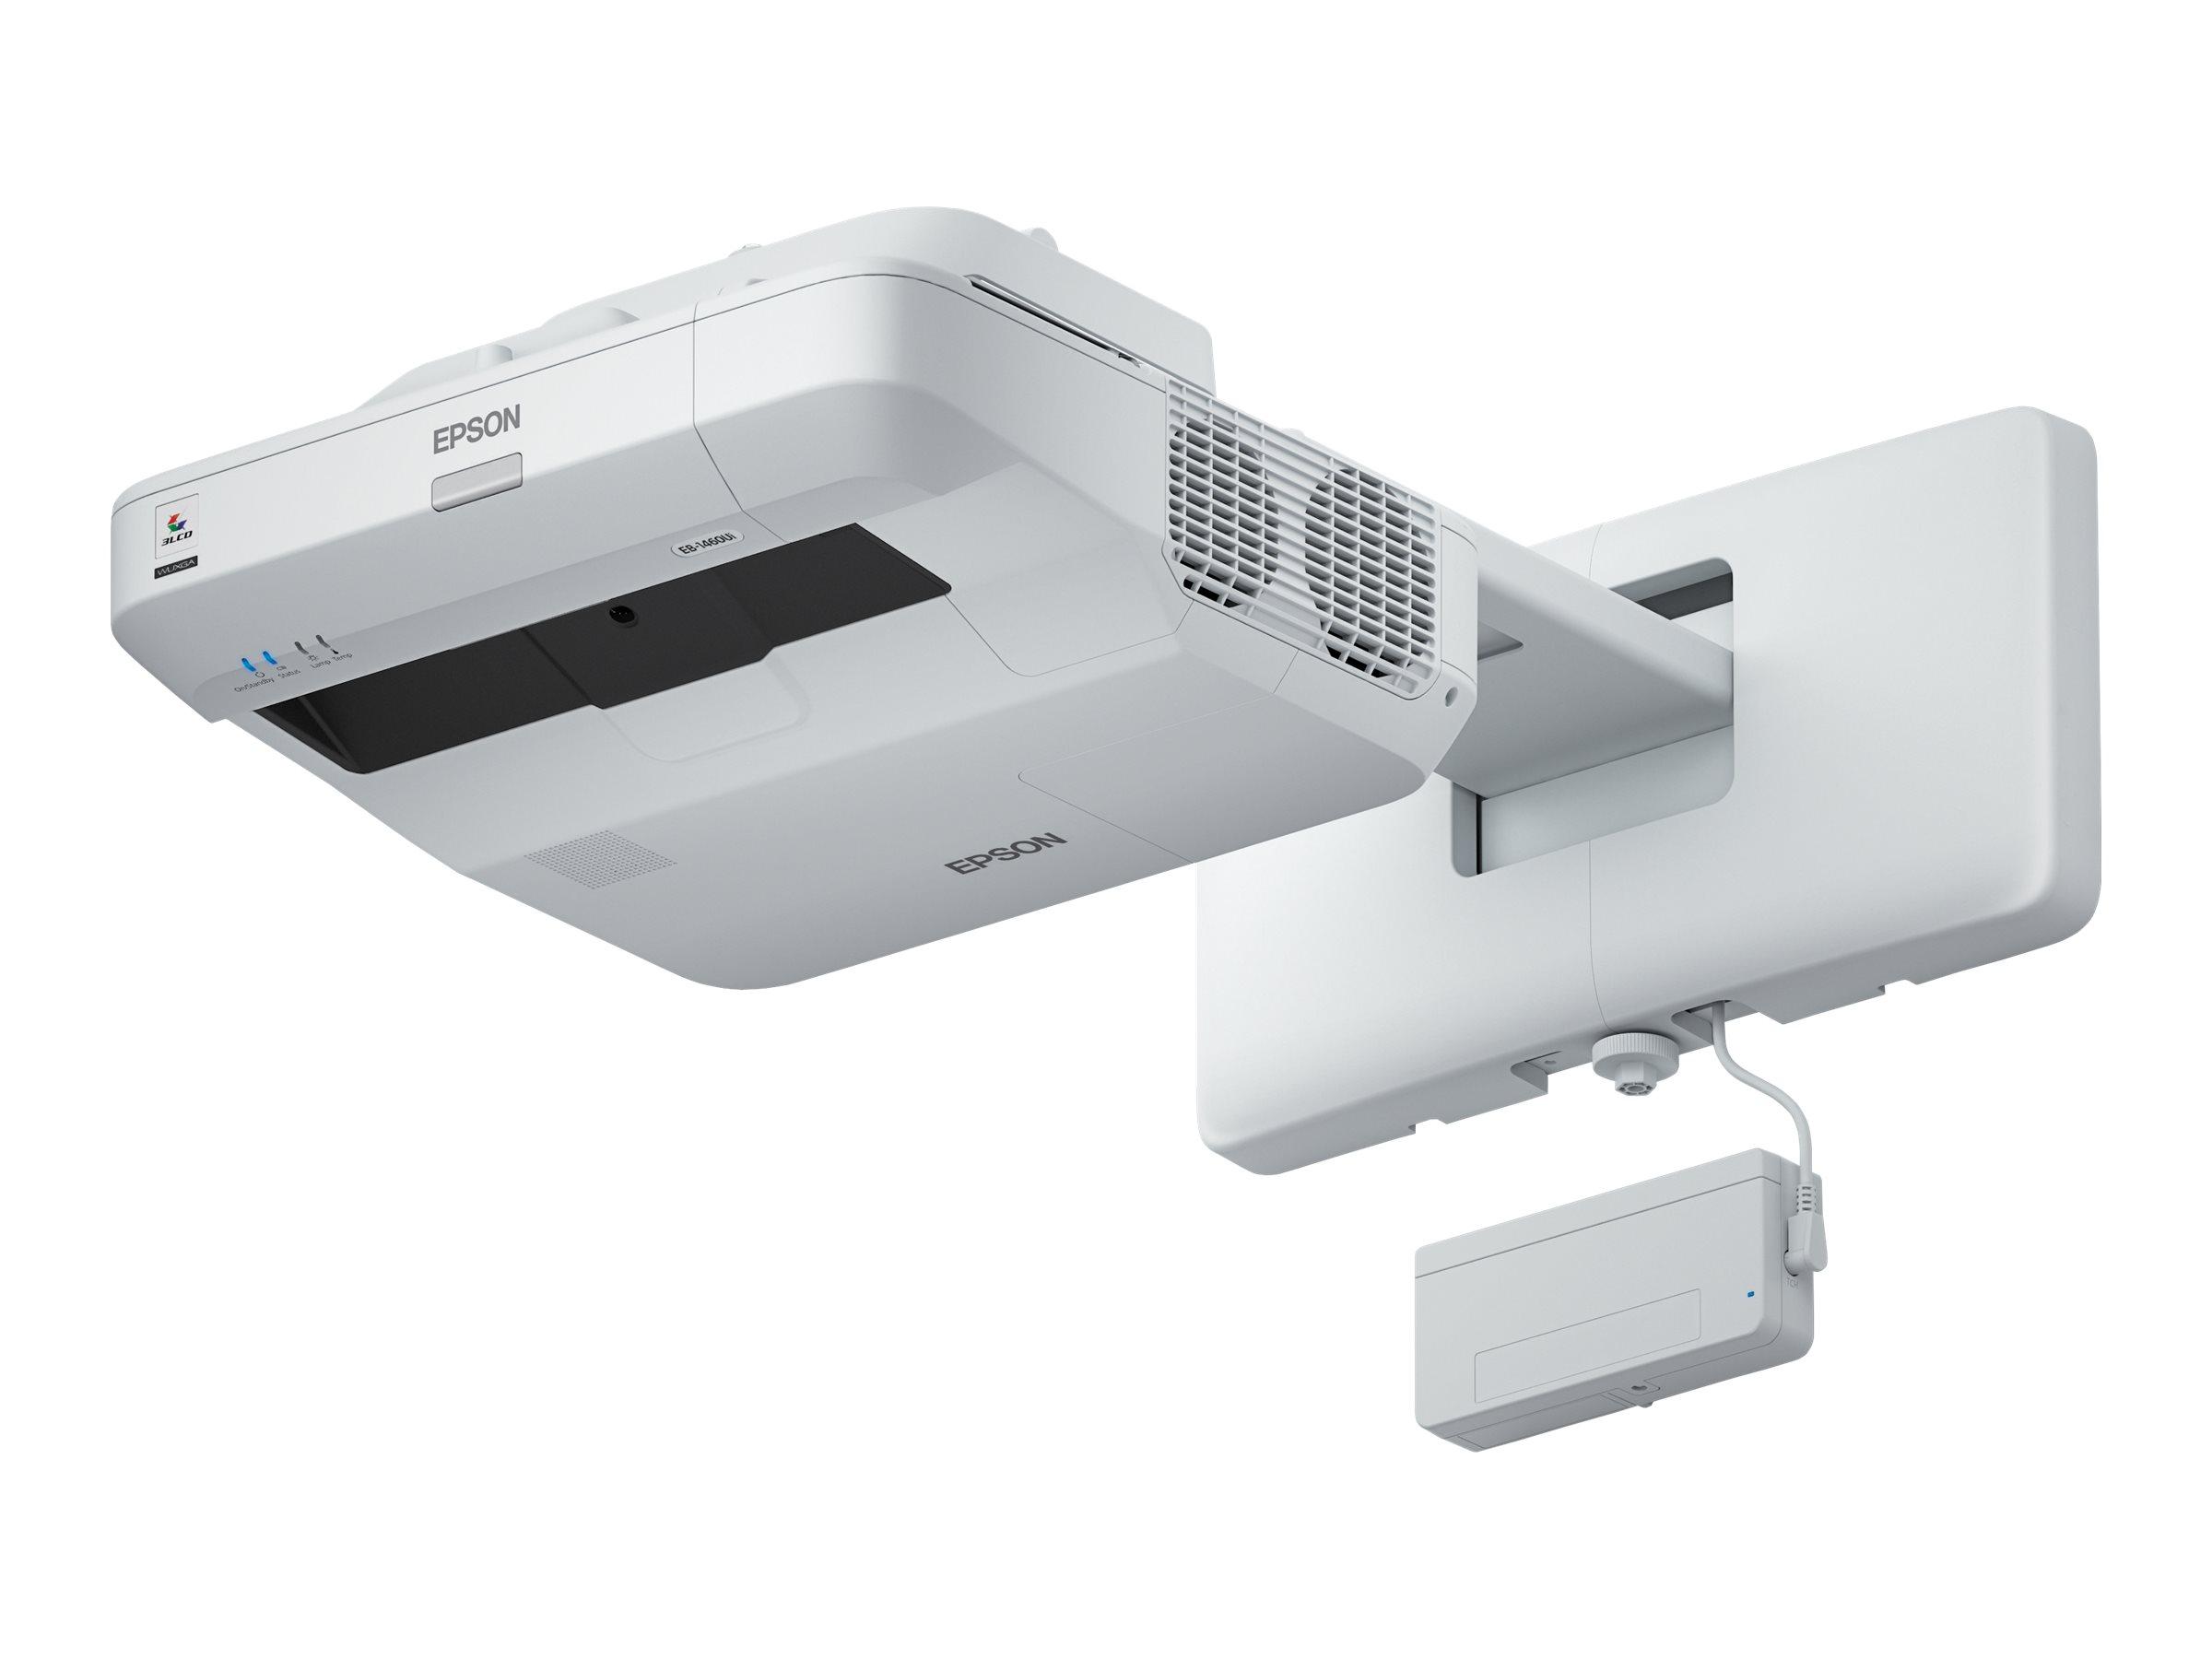 Epson EB-1450Ui - 3-LCD-Projektor - 3800 lm (weiss) - 3800 lm (Farbe) - WUXGA (1920 x 1200) - 16:10